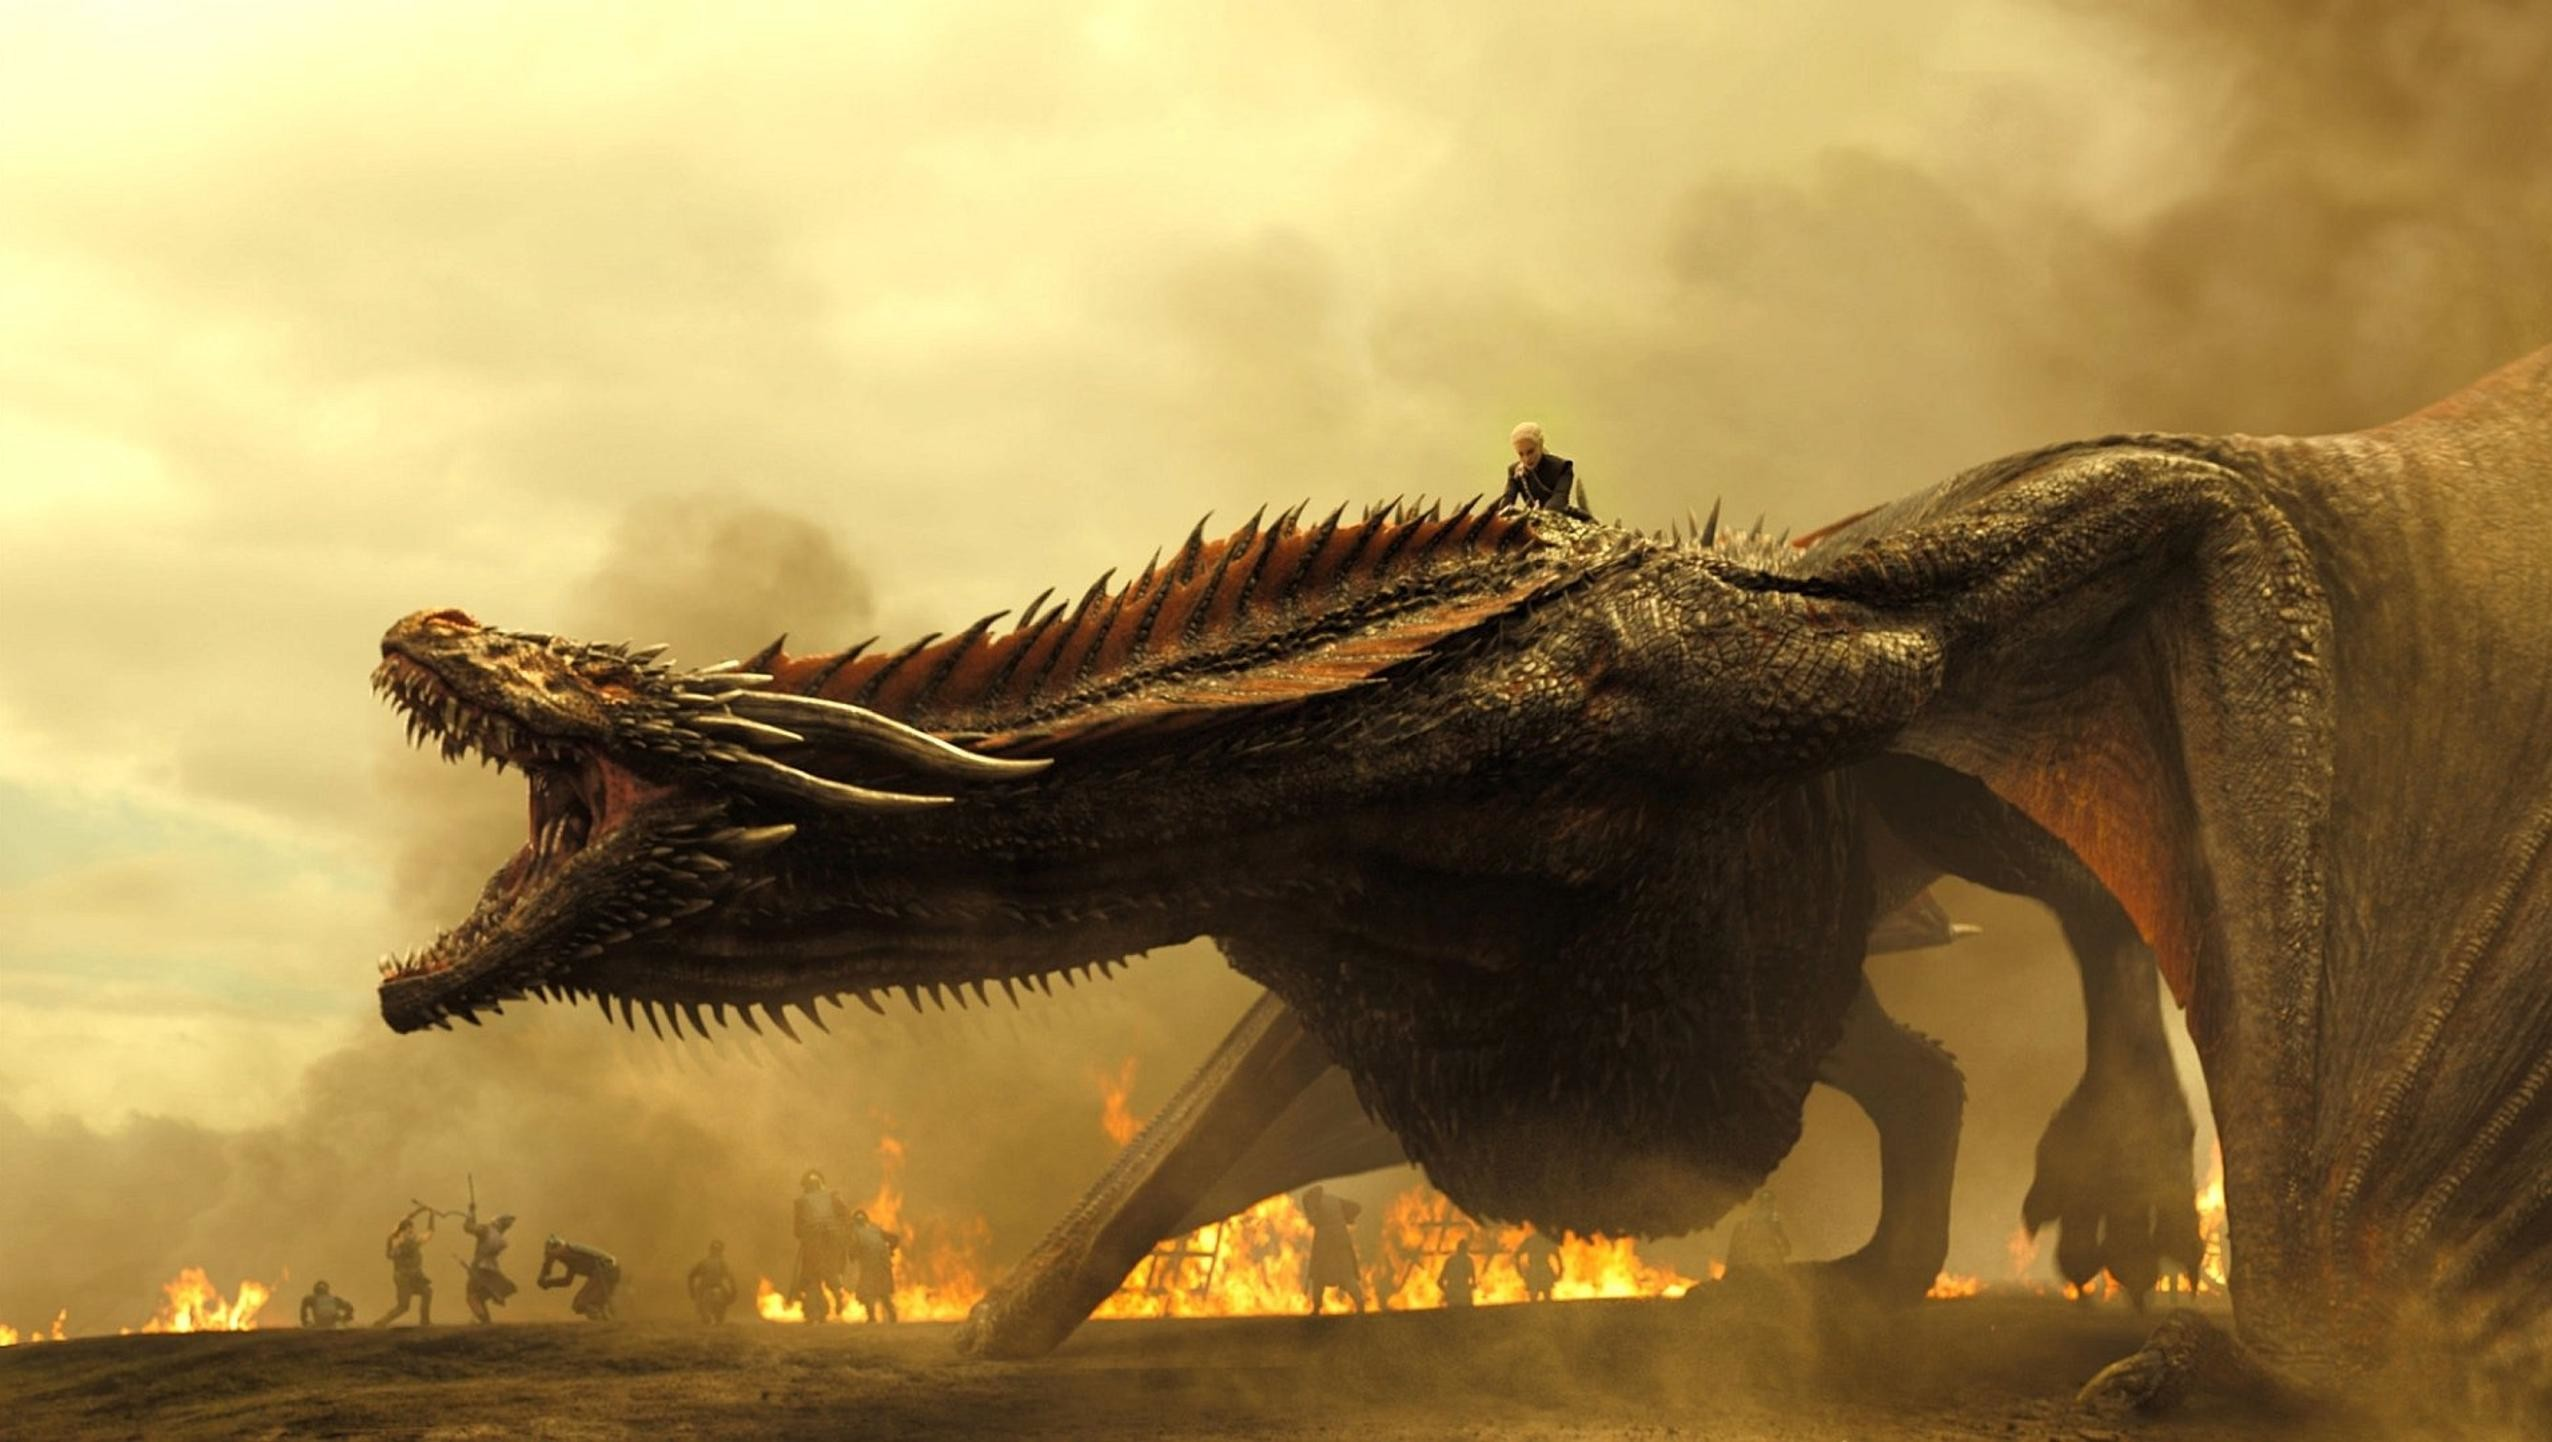 2552x1442, Wallpaper For Game Of Thrones - Desktop Game Of Thrones Dragon - HD Wallpaper